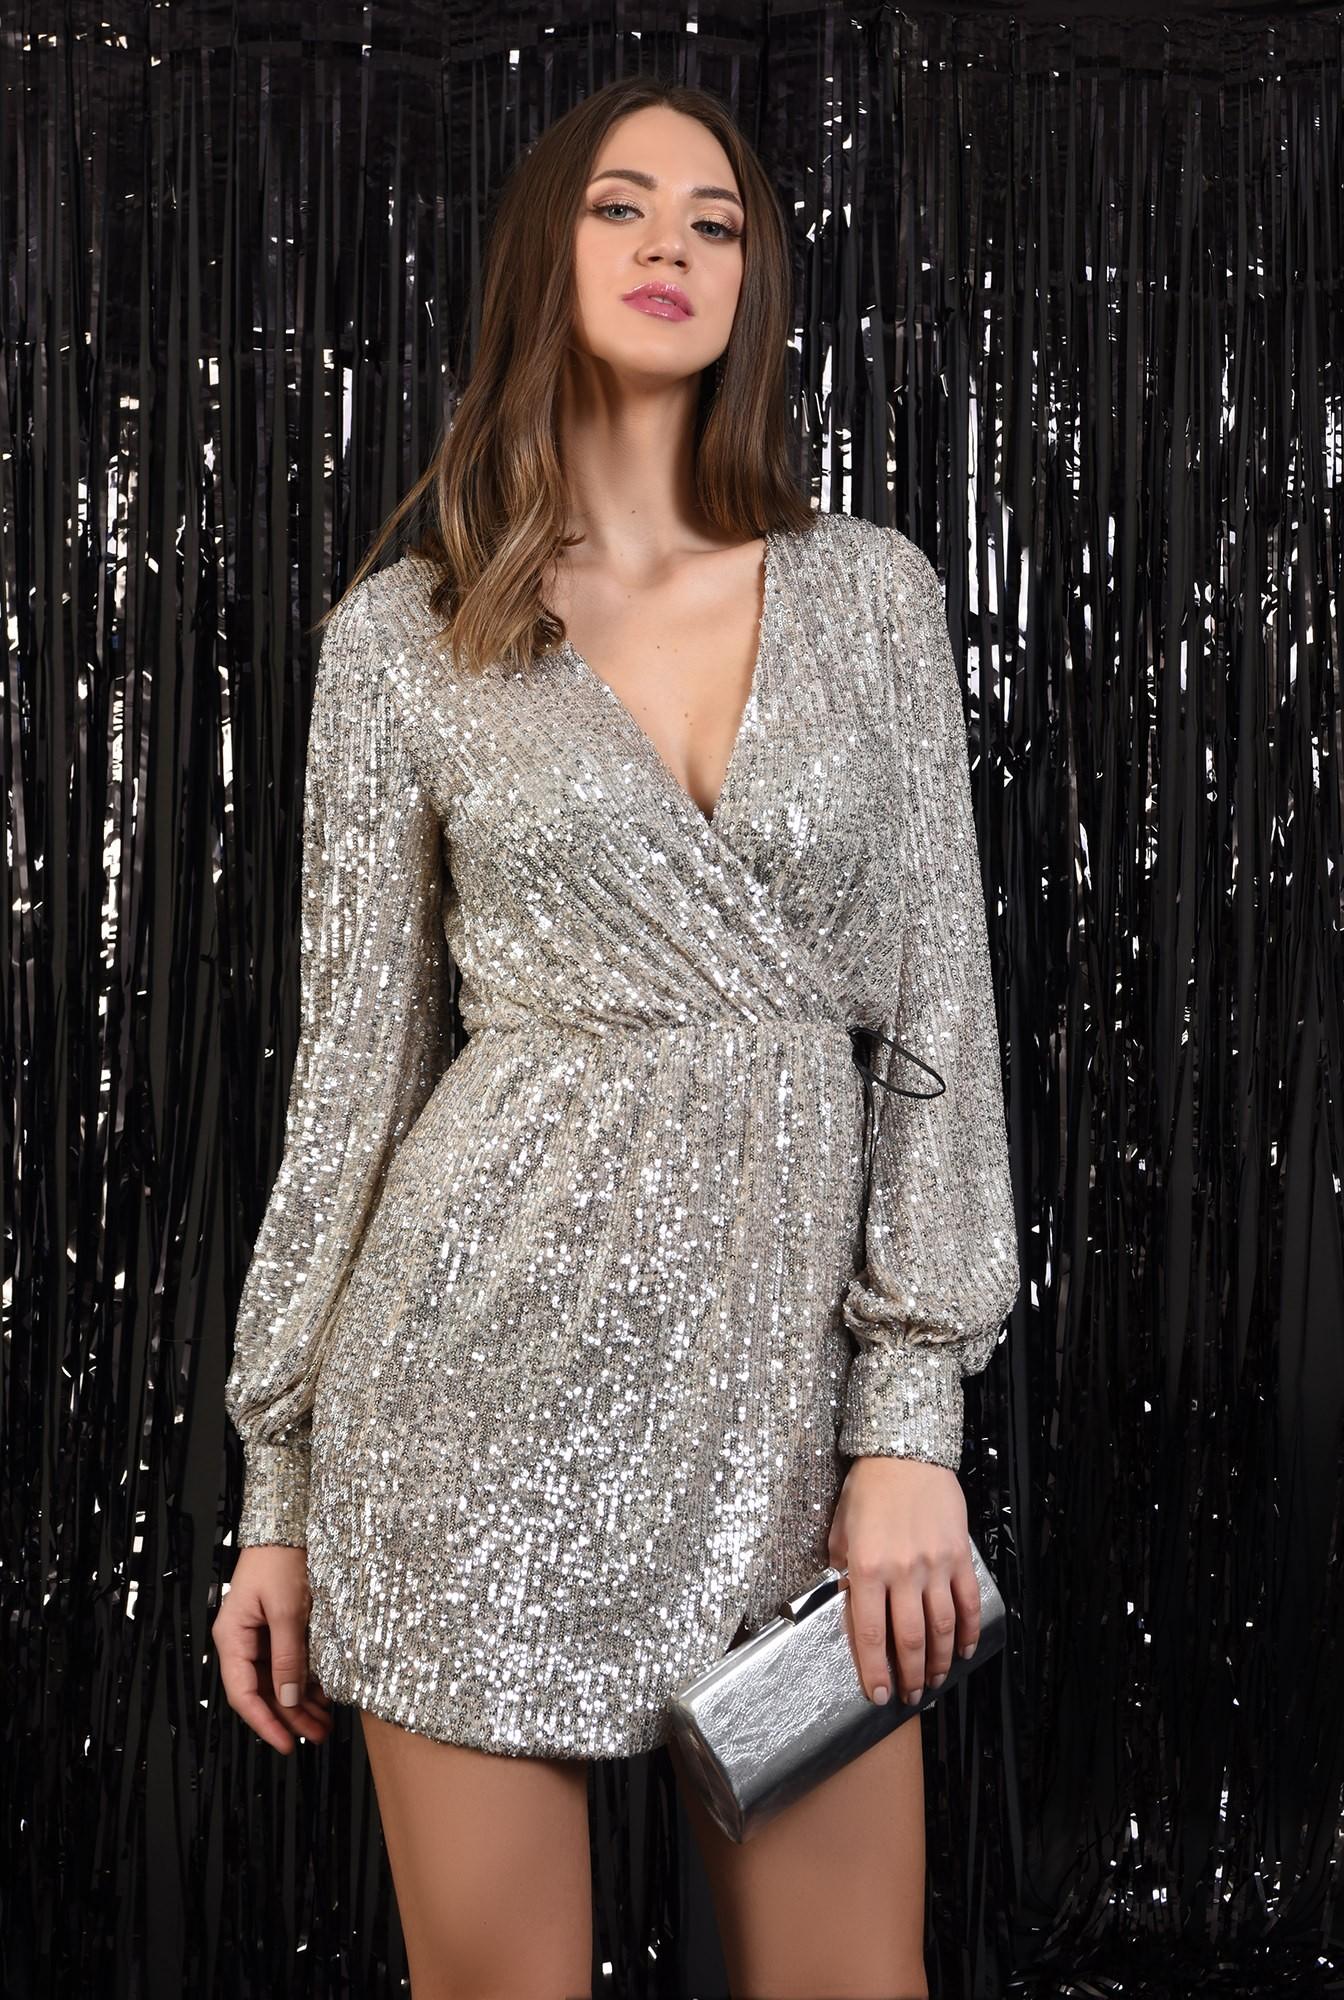 0 - 360 - rochie eleganta, cu paiete, aurie, snur din piele, scurta, Poema